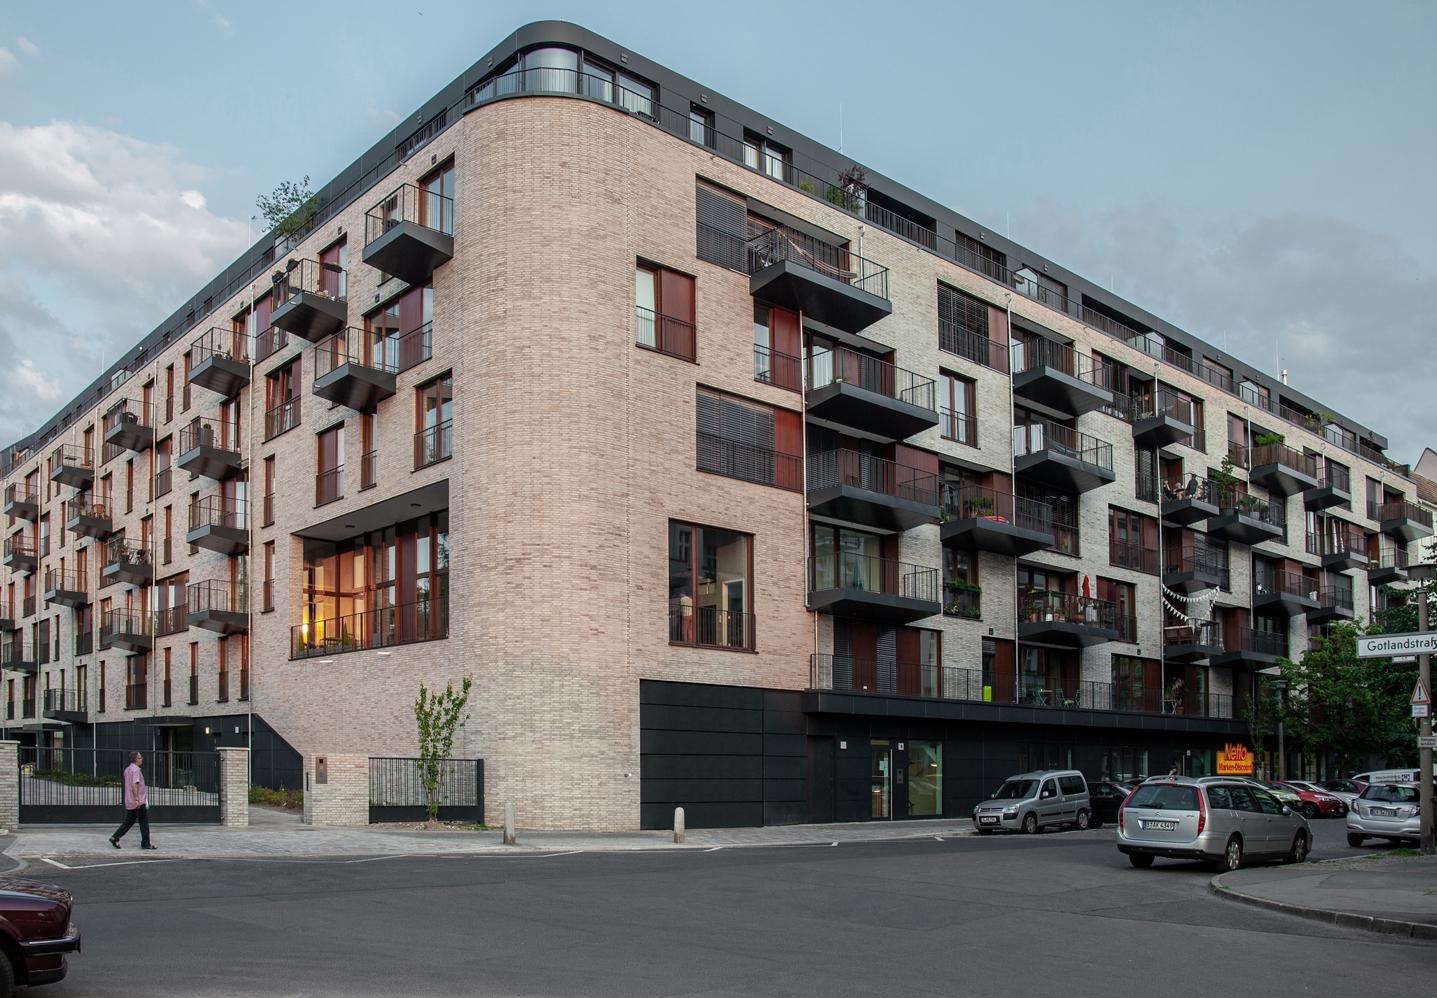 255 Gotland